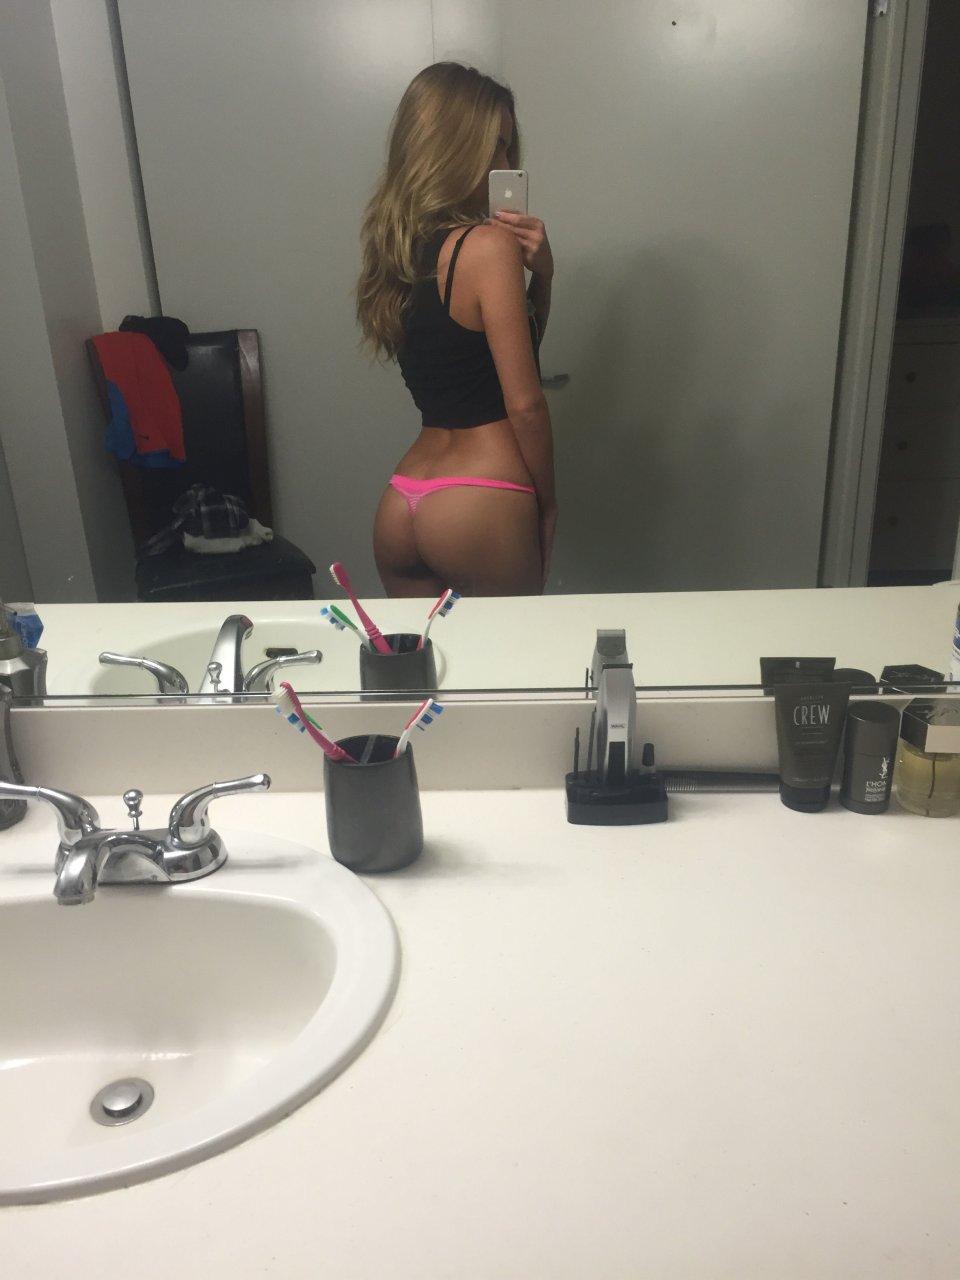 Kelsey-Laverack-Leaked-TheFappeningBlog.com-9.jpg